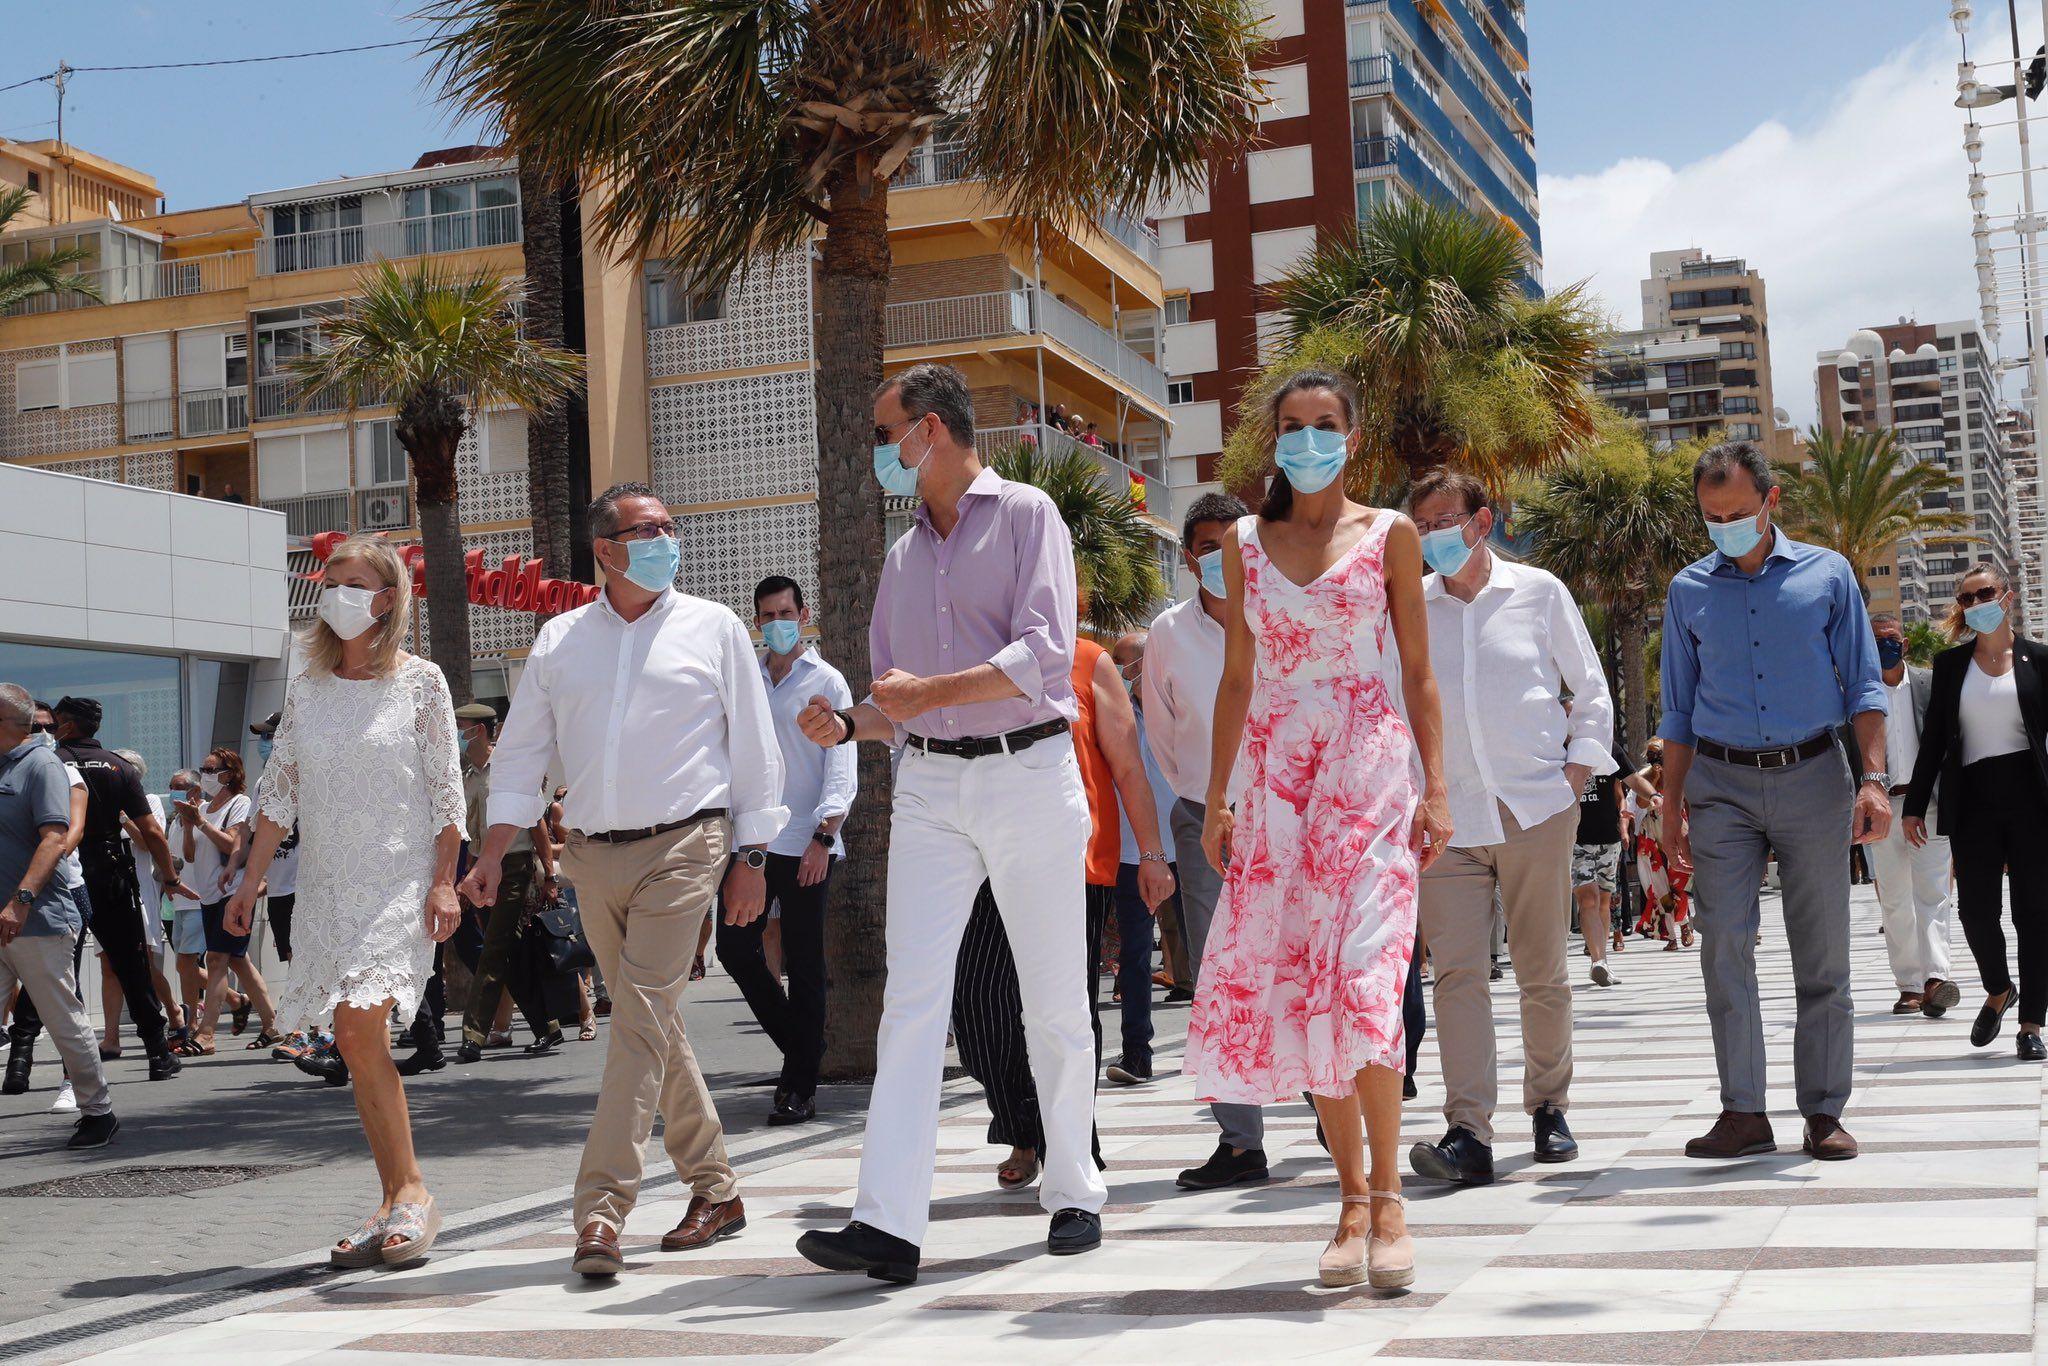 Queen Letizia Wore White And Pink Adolfo Dominguez Dress To Visit Benidrom And Valencia Queen Letizia Benidorm Queen